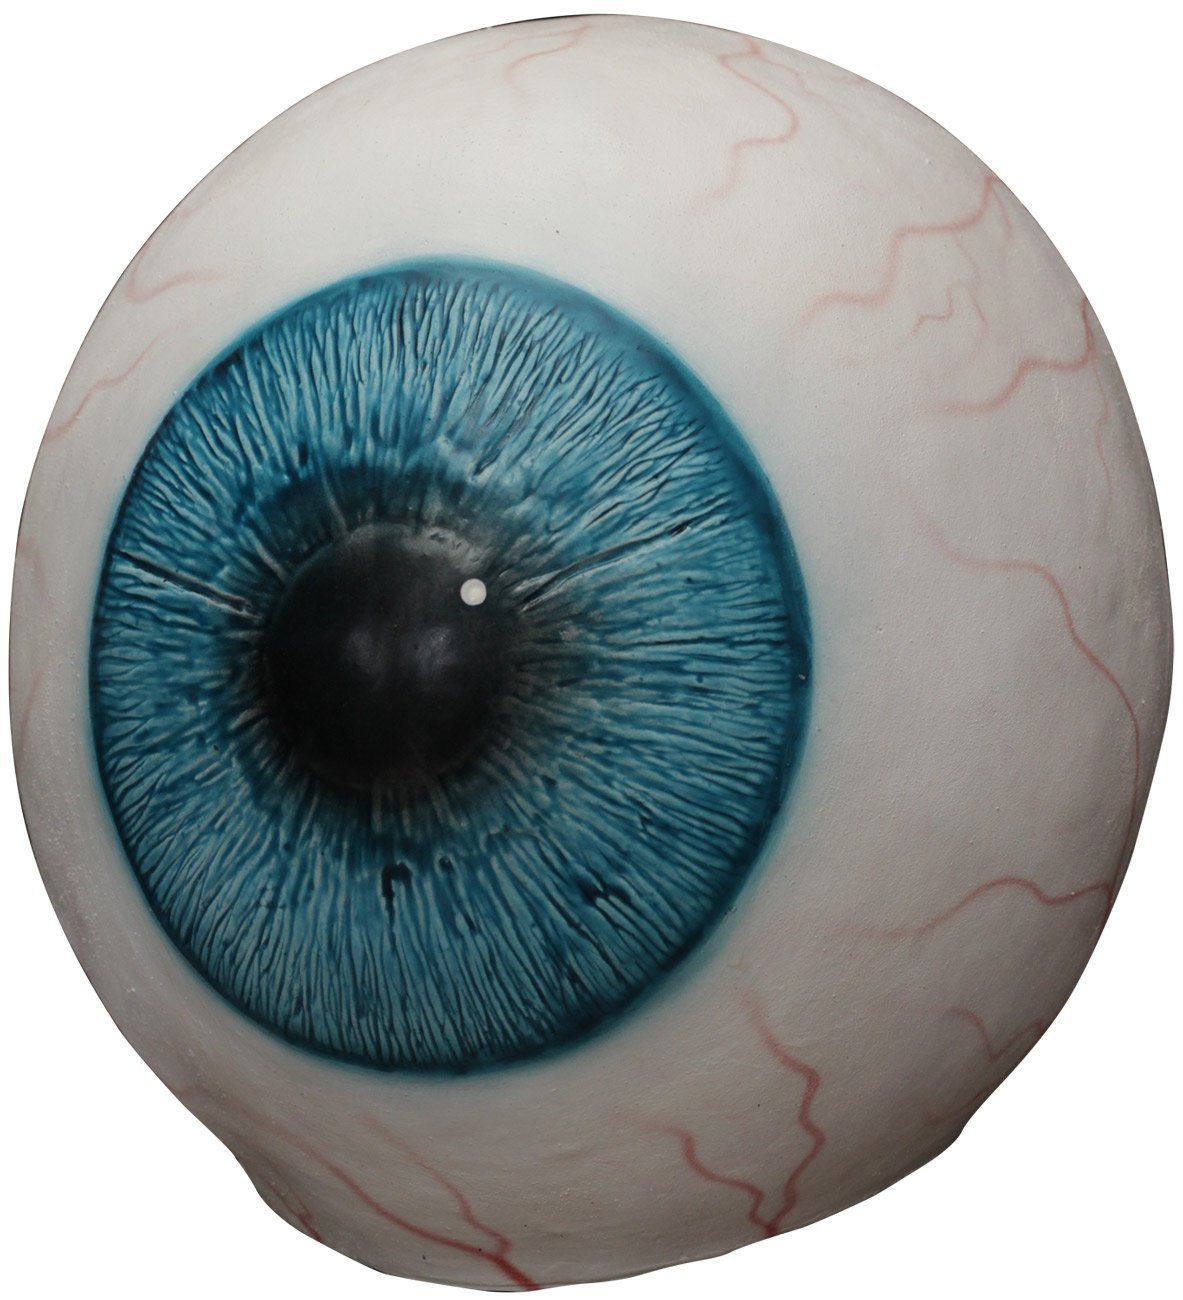 Standard The Eye Adult Mask Standard